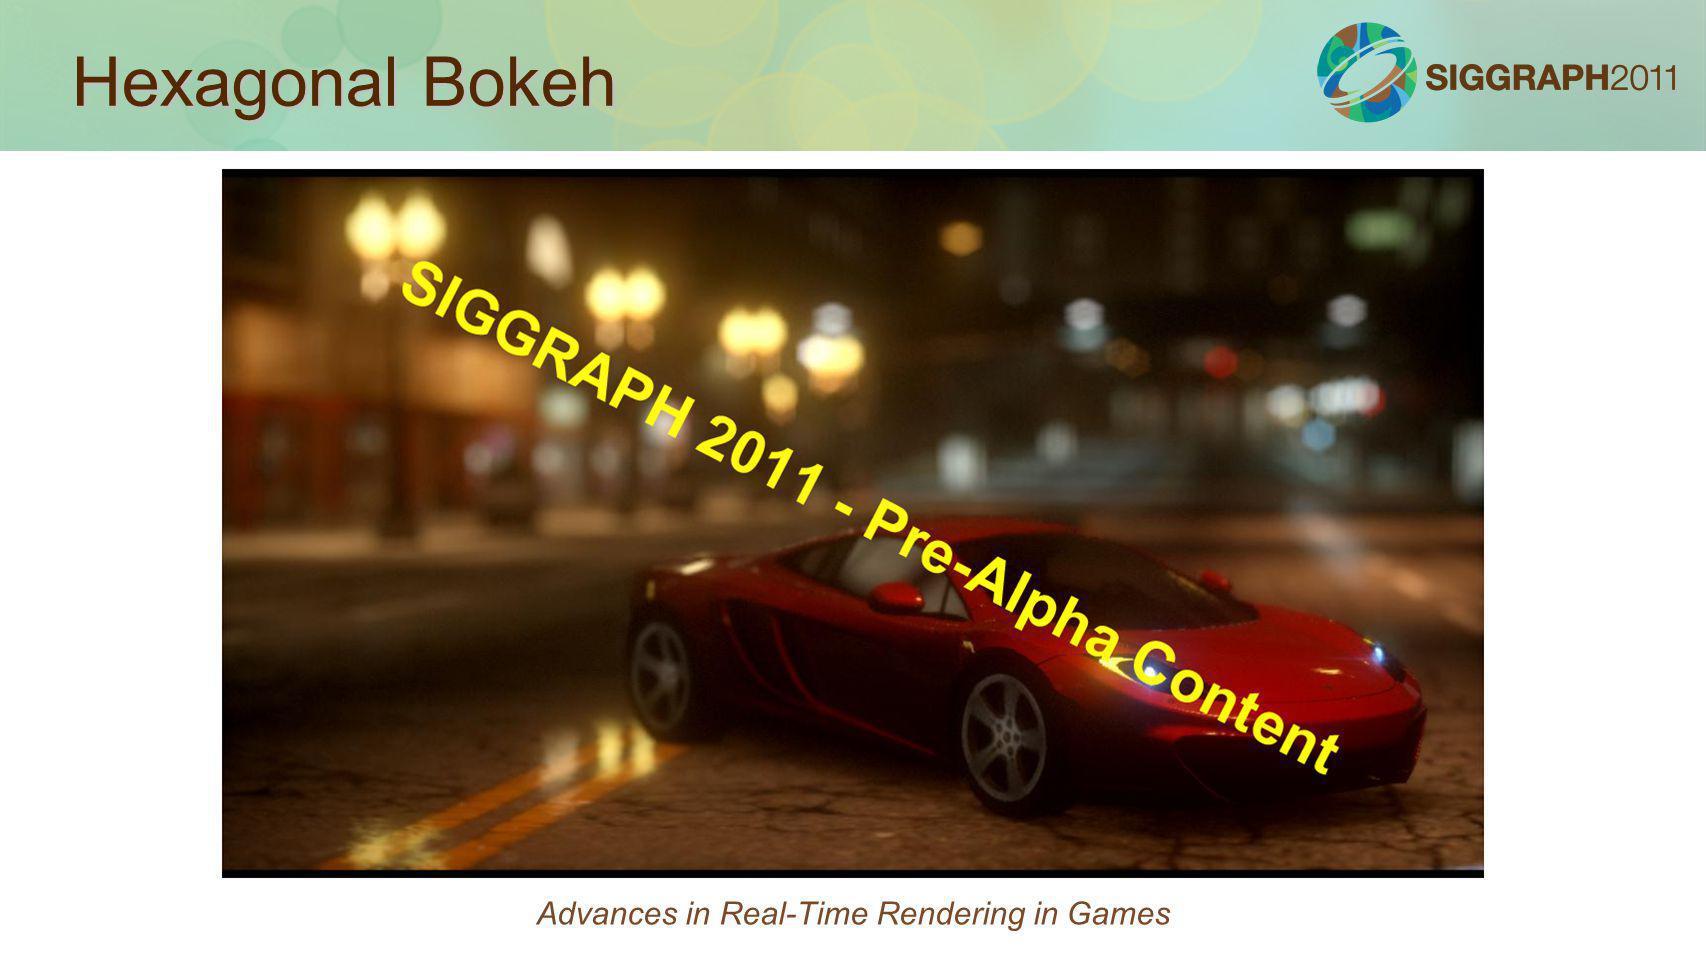 Hexagonal Bokeh Advances in Real-Time Rendering in Games